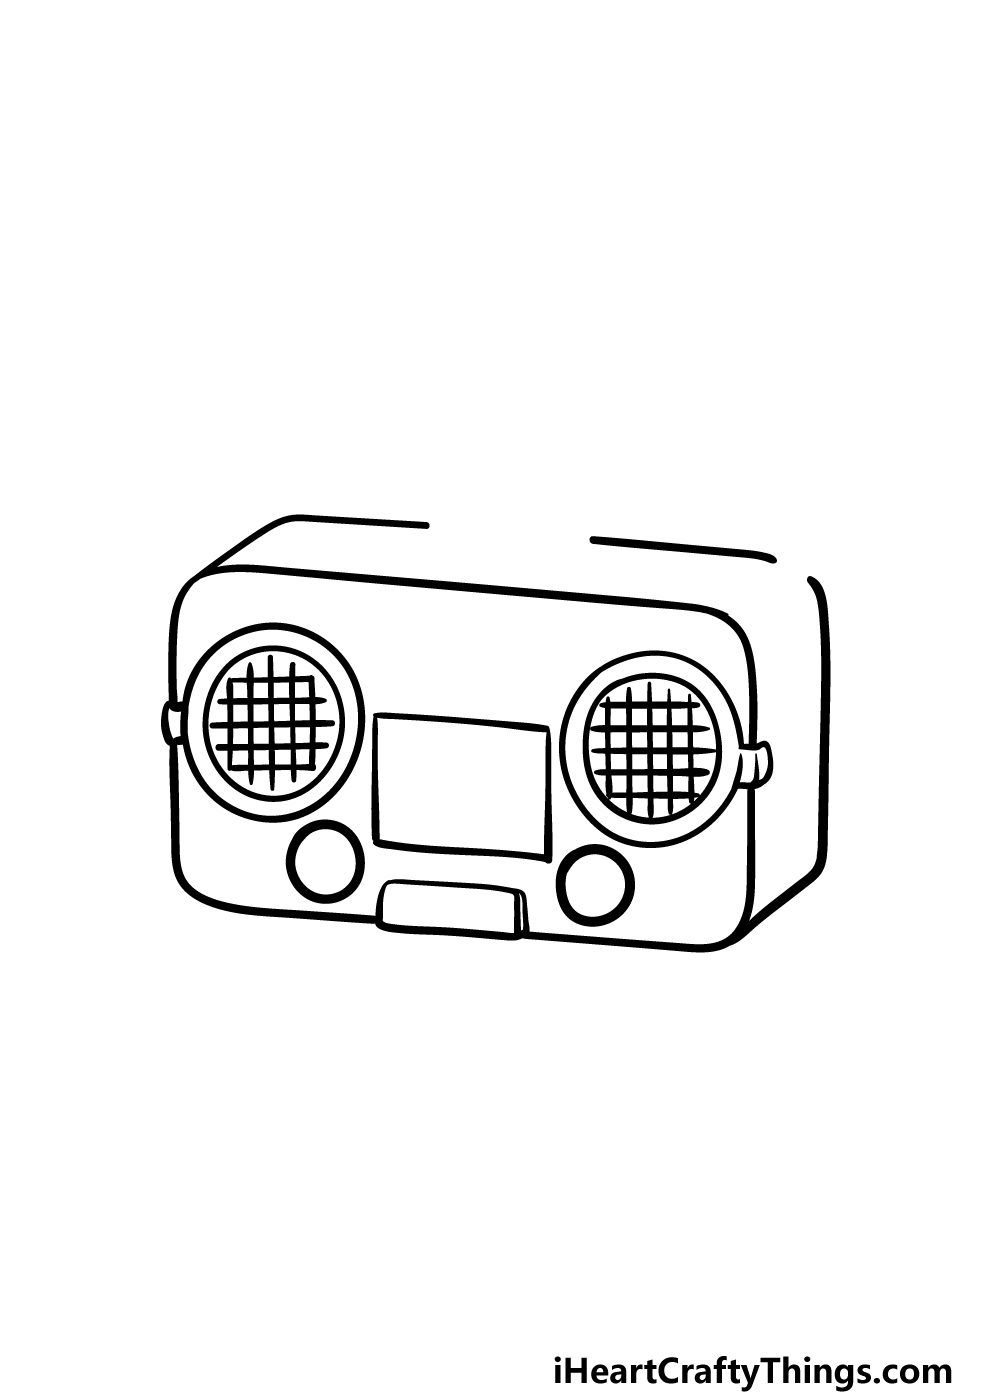 drawing a radio step 2